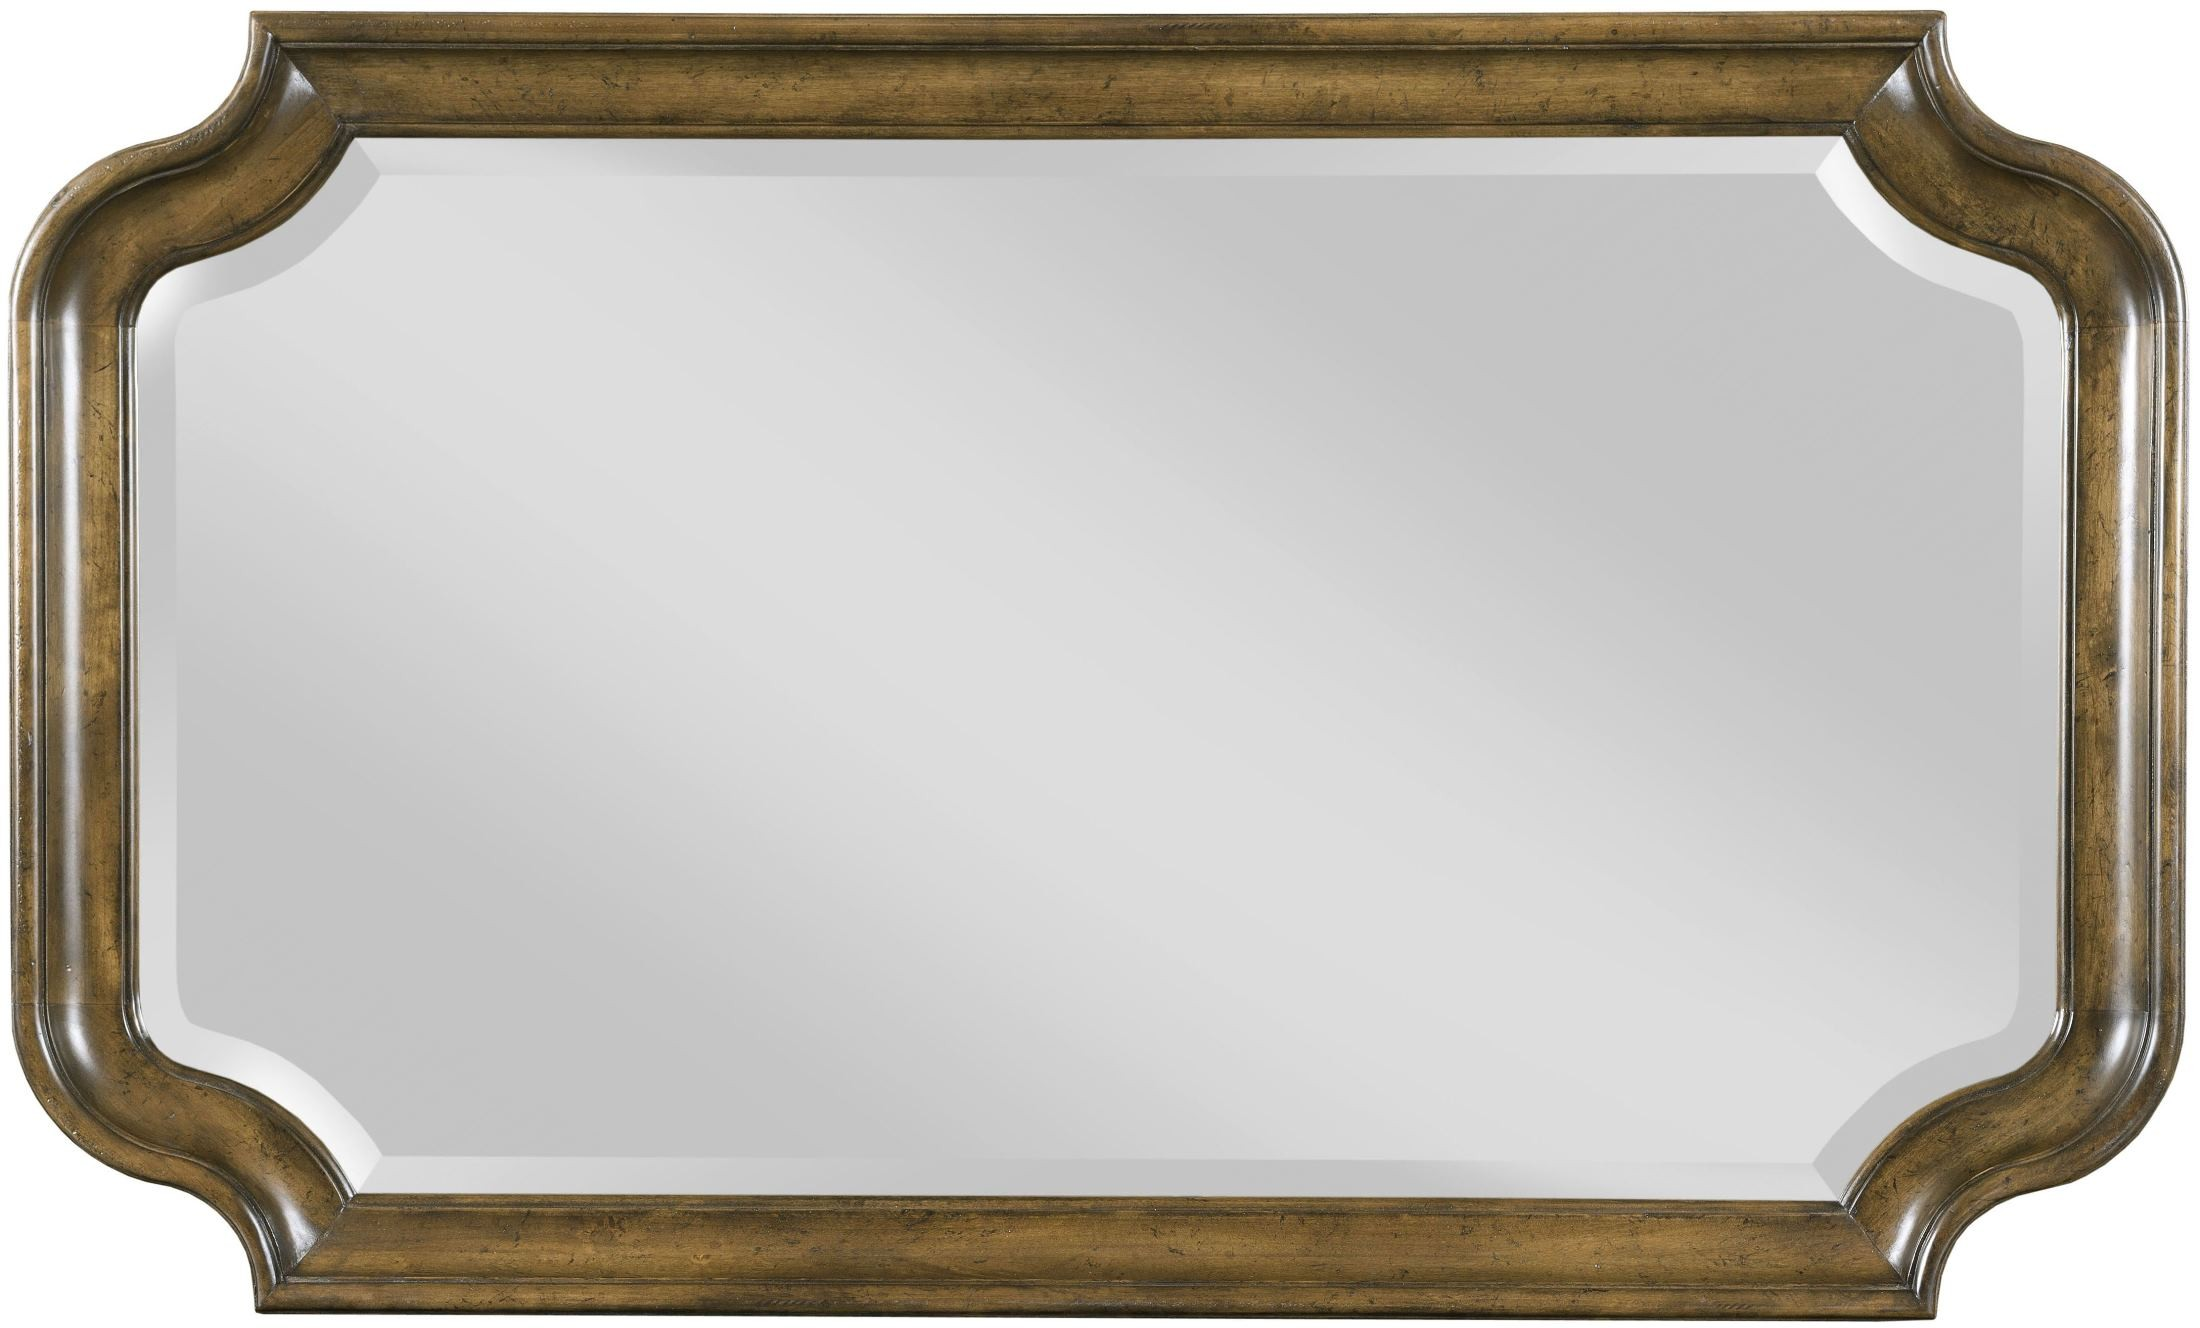 Portolone bureau mirror from kincaid 95 118 coleman for Bureau with mirror